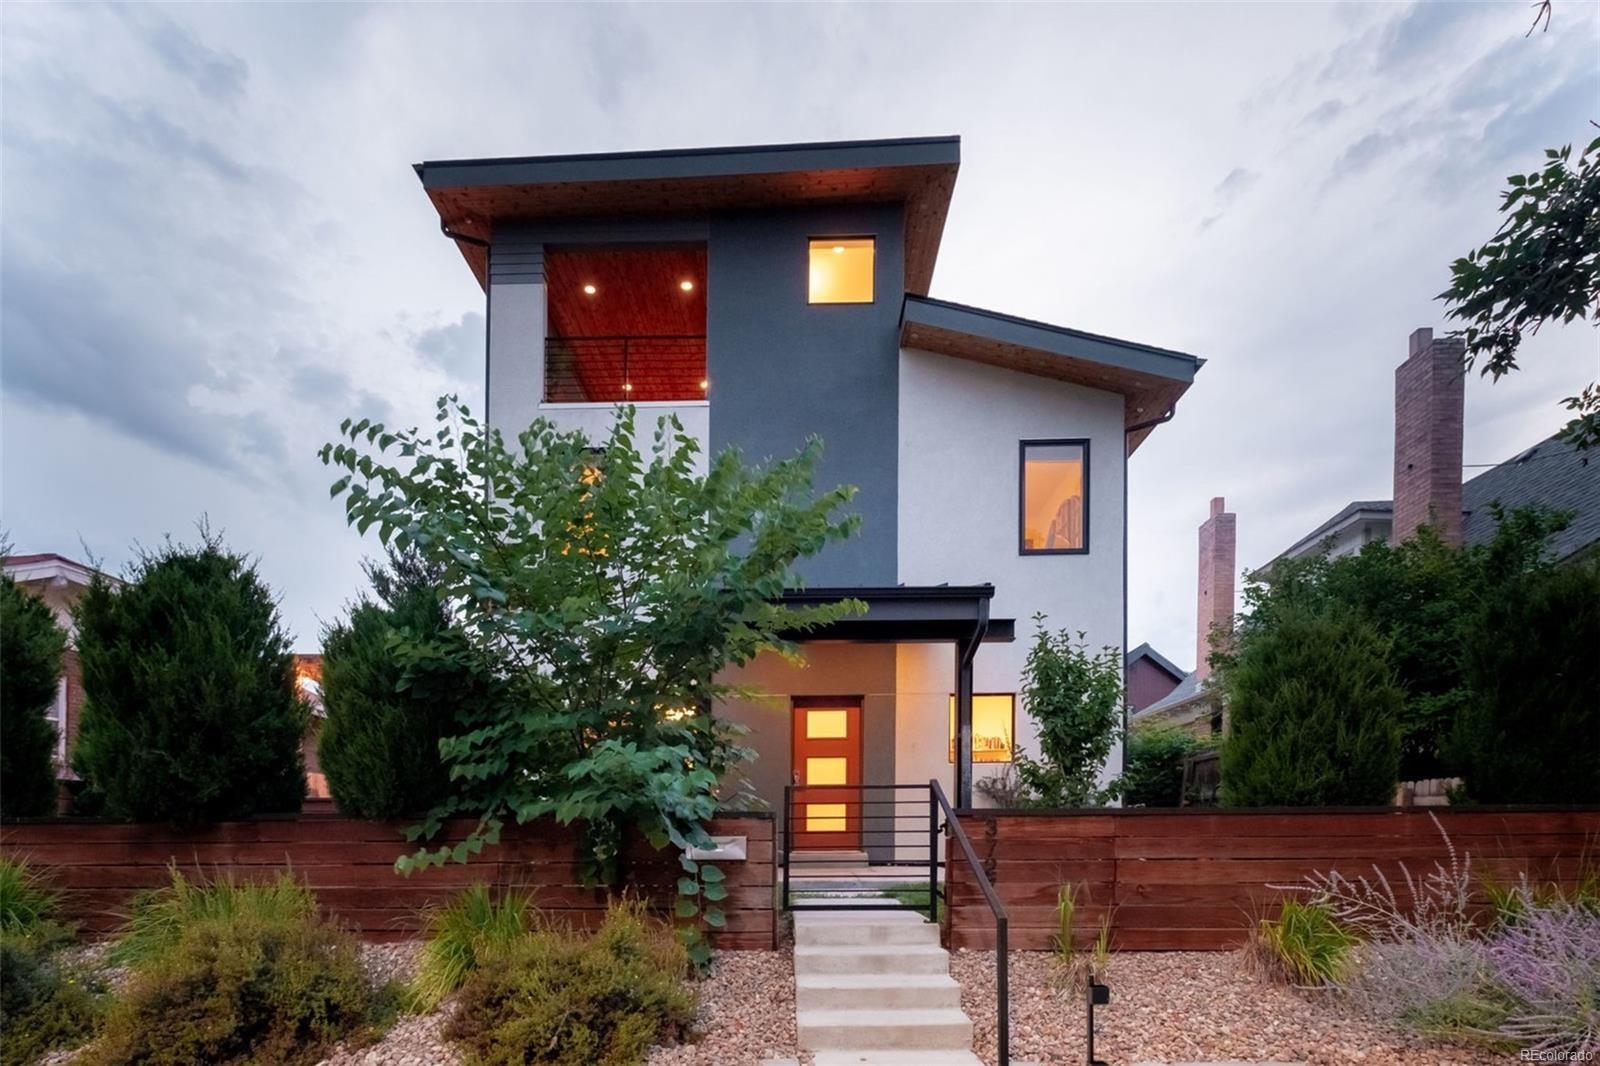 MLS# 5301772 - 1 - 3727 Tejon Street, Denver, CO 80211